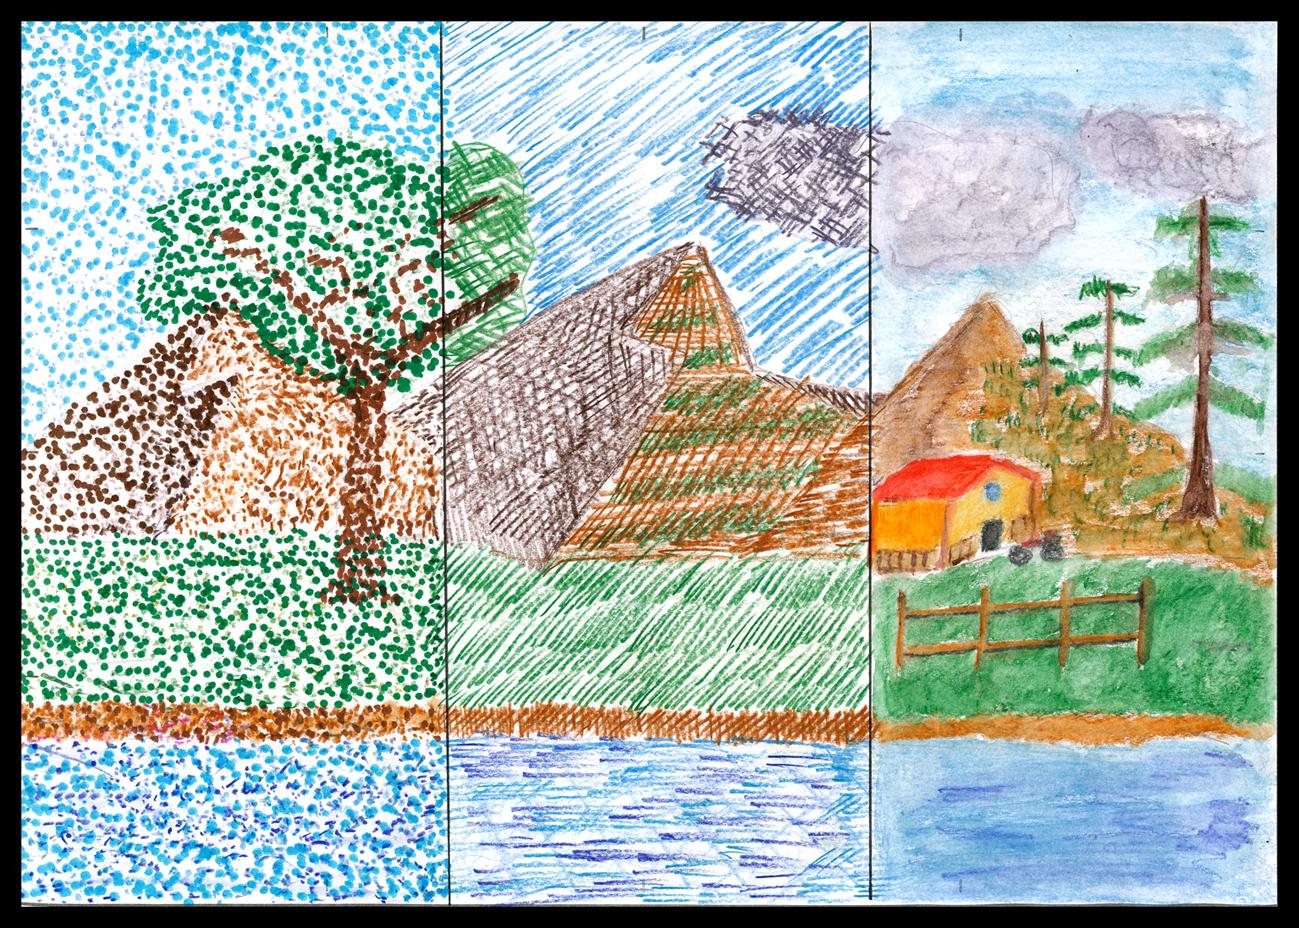 Dibujo De Lineas Paisaje: Paisajes Con Puntos Y Lineas